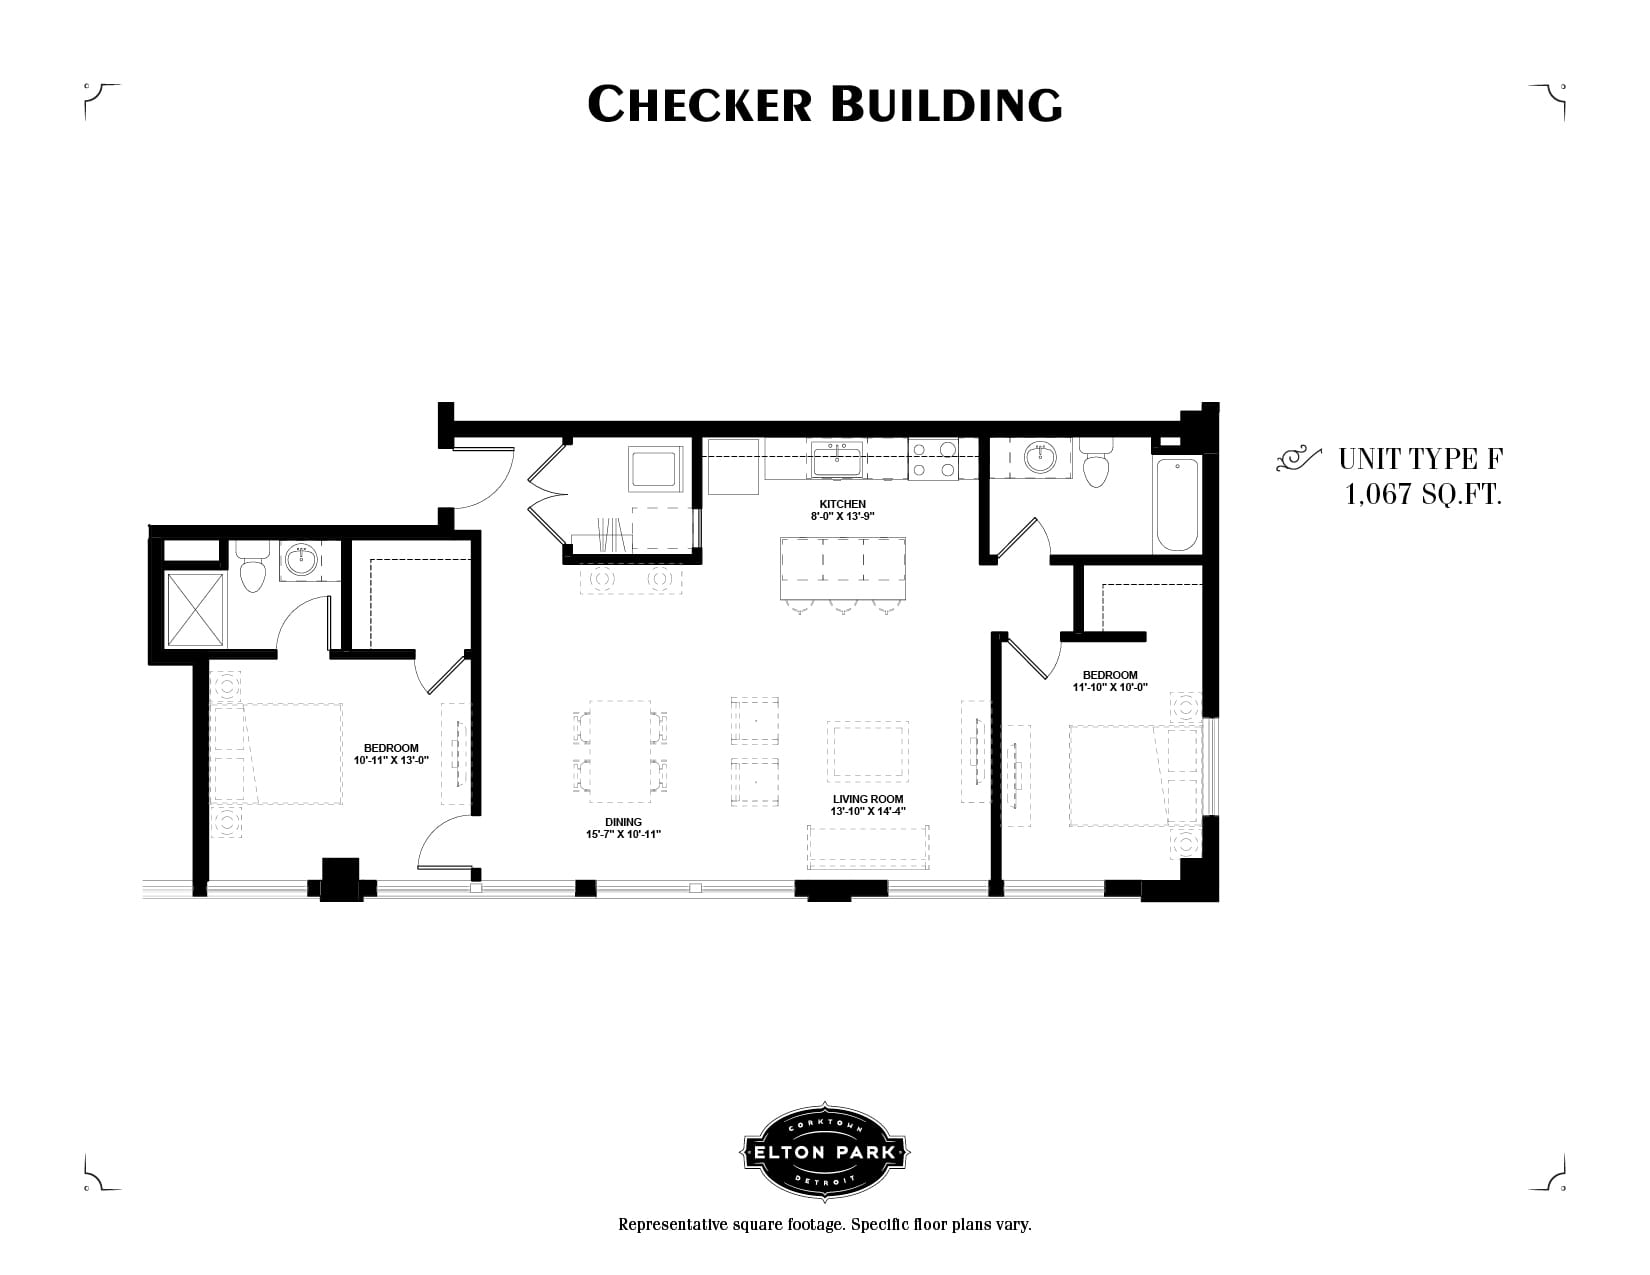 Checker Building Unit Type F